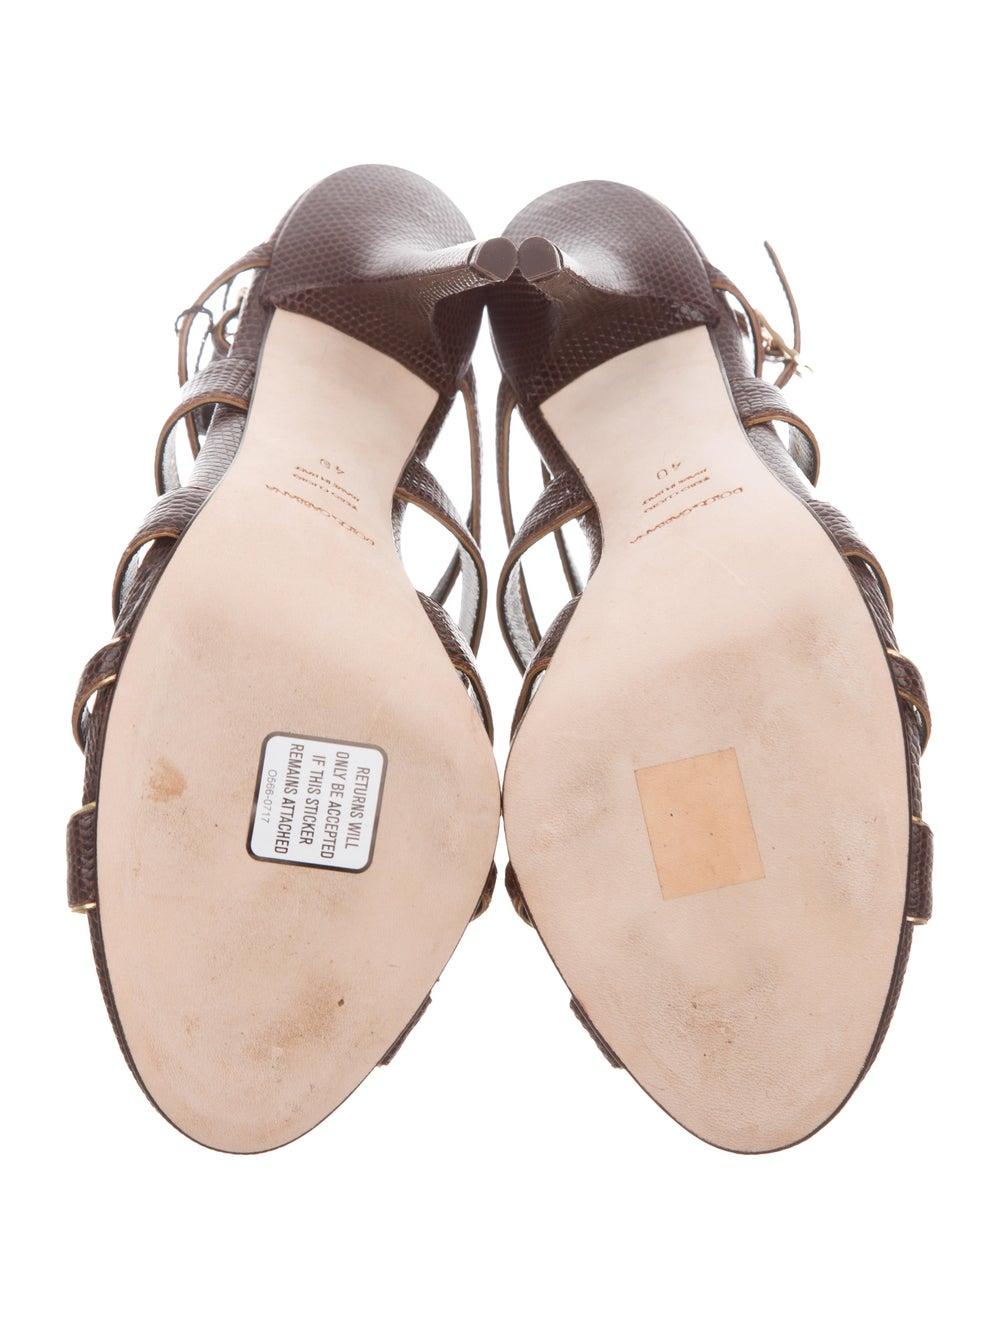 Dolce & Gabbana Lizard Strappy Sandals - image 5